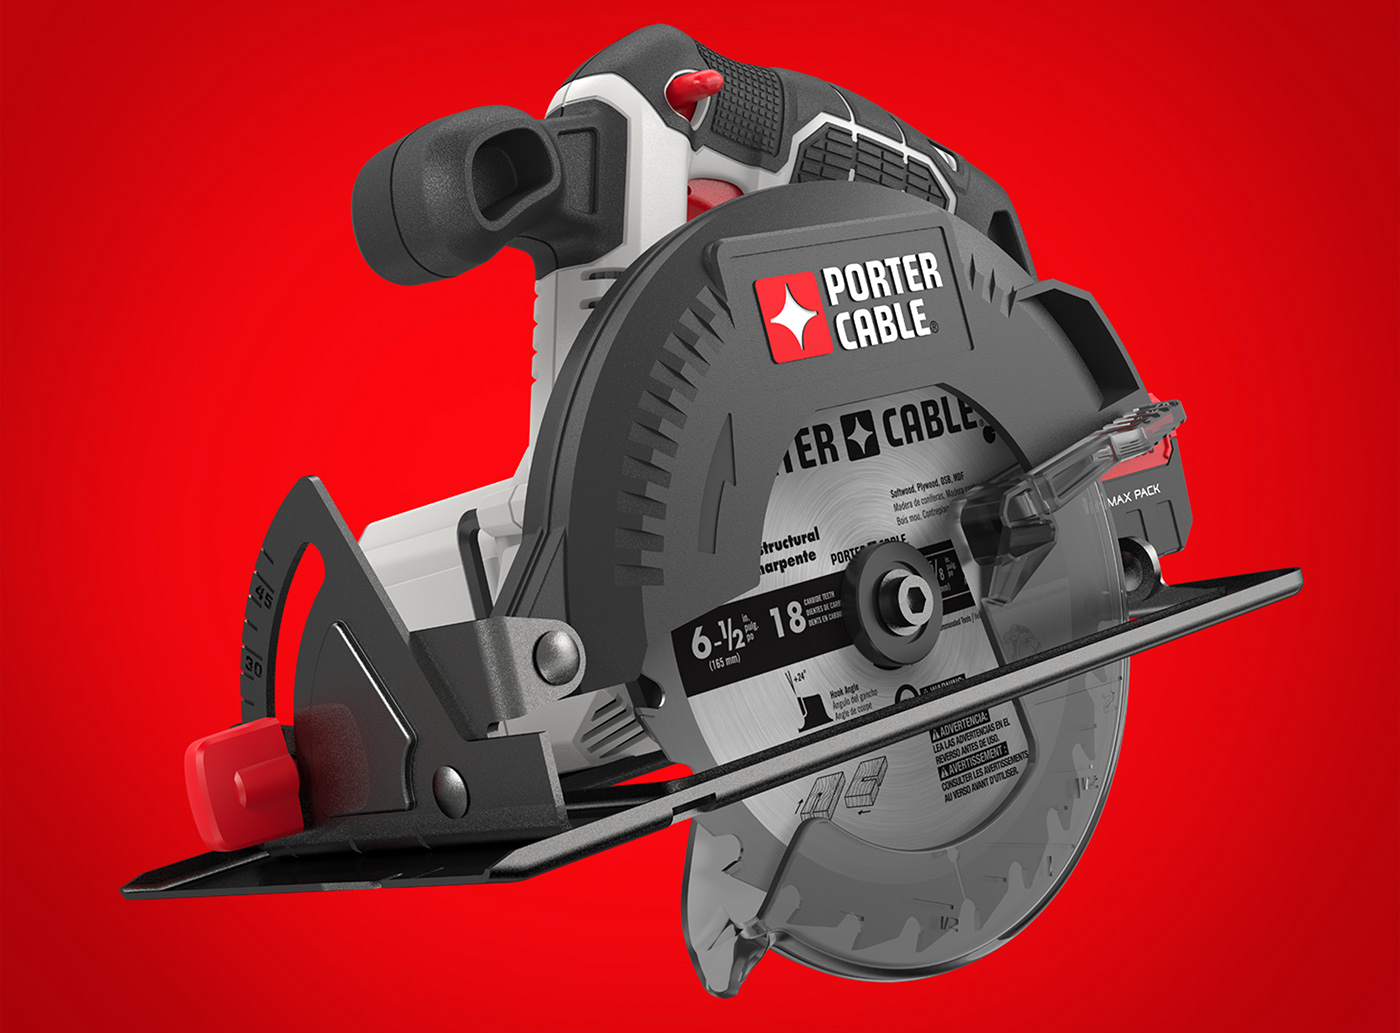 Porter Cable 20V Circ Saw on Behance